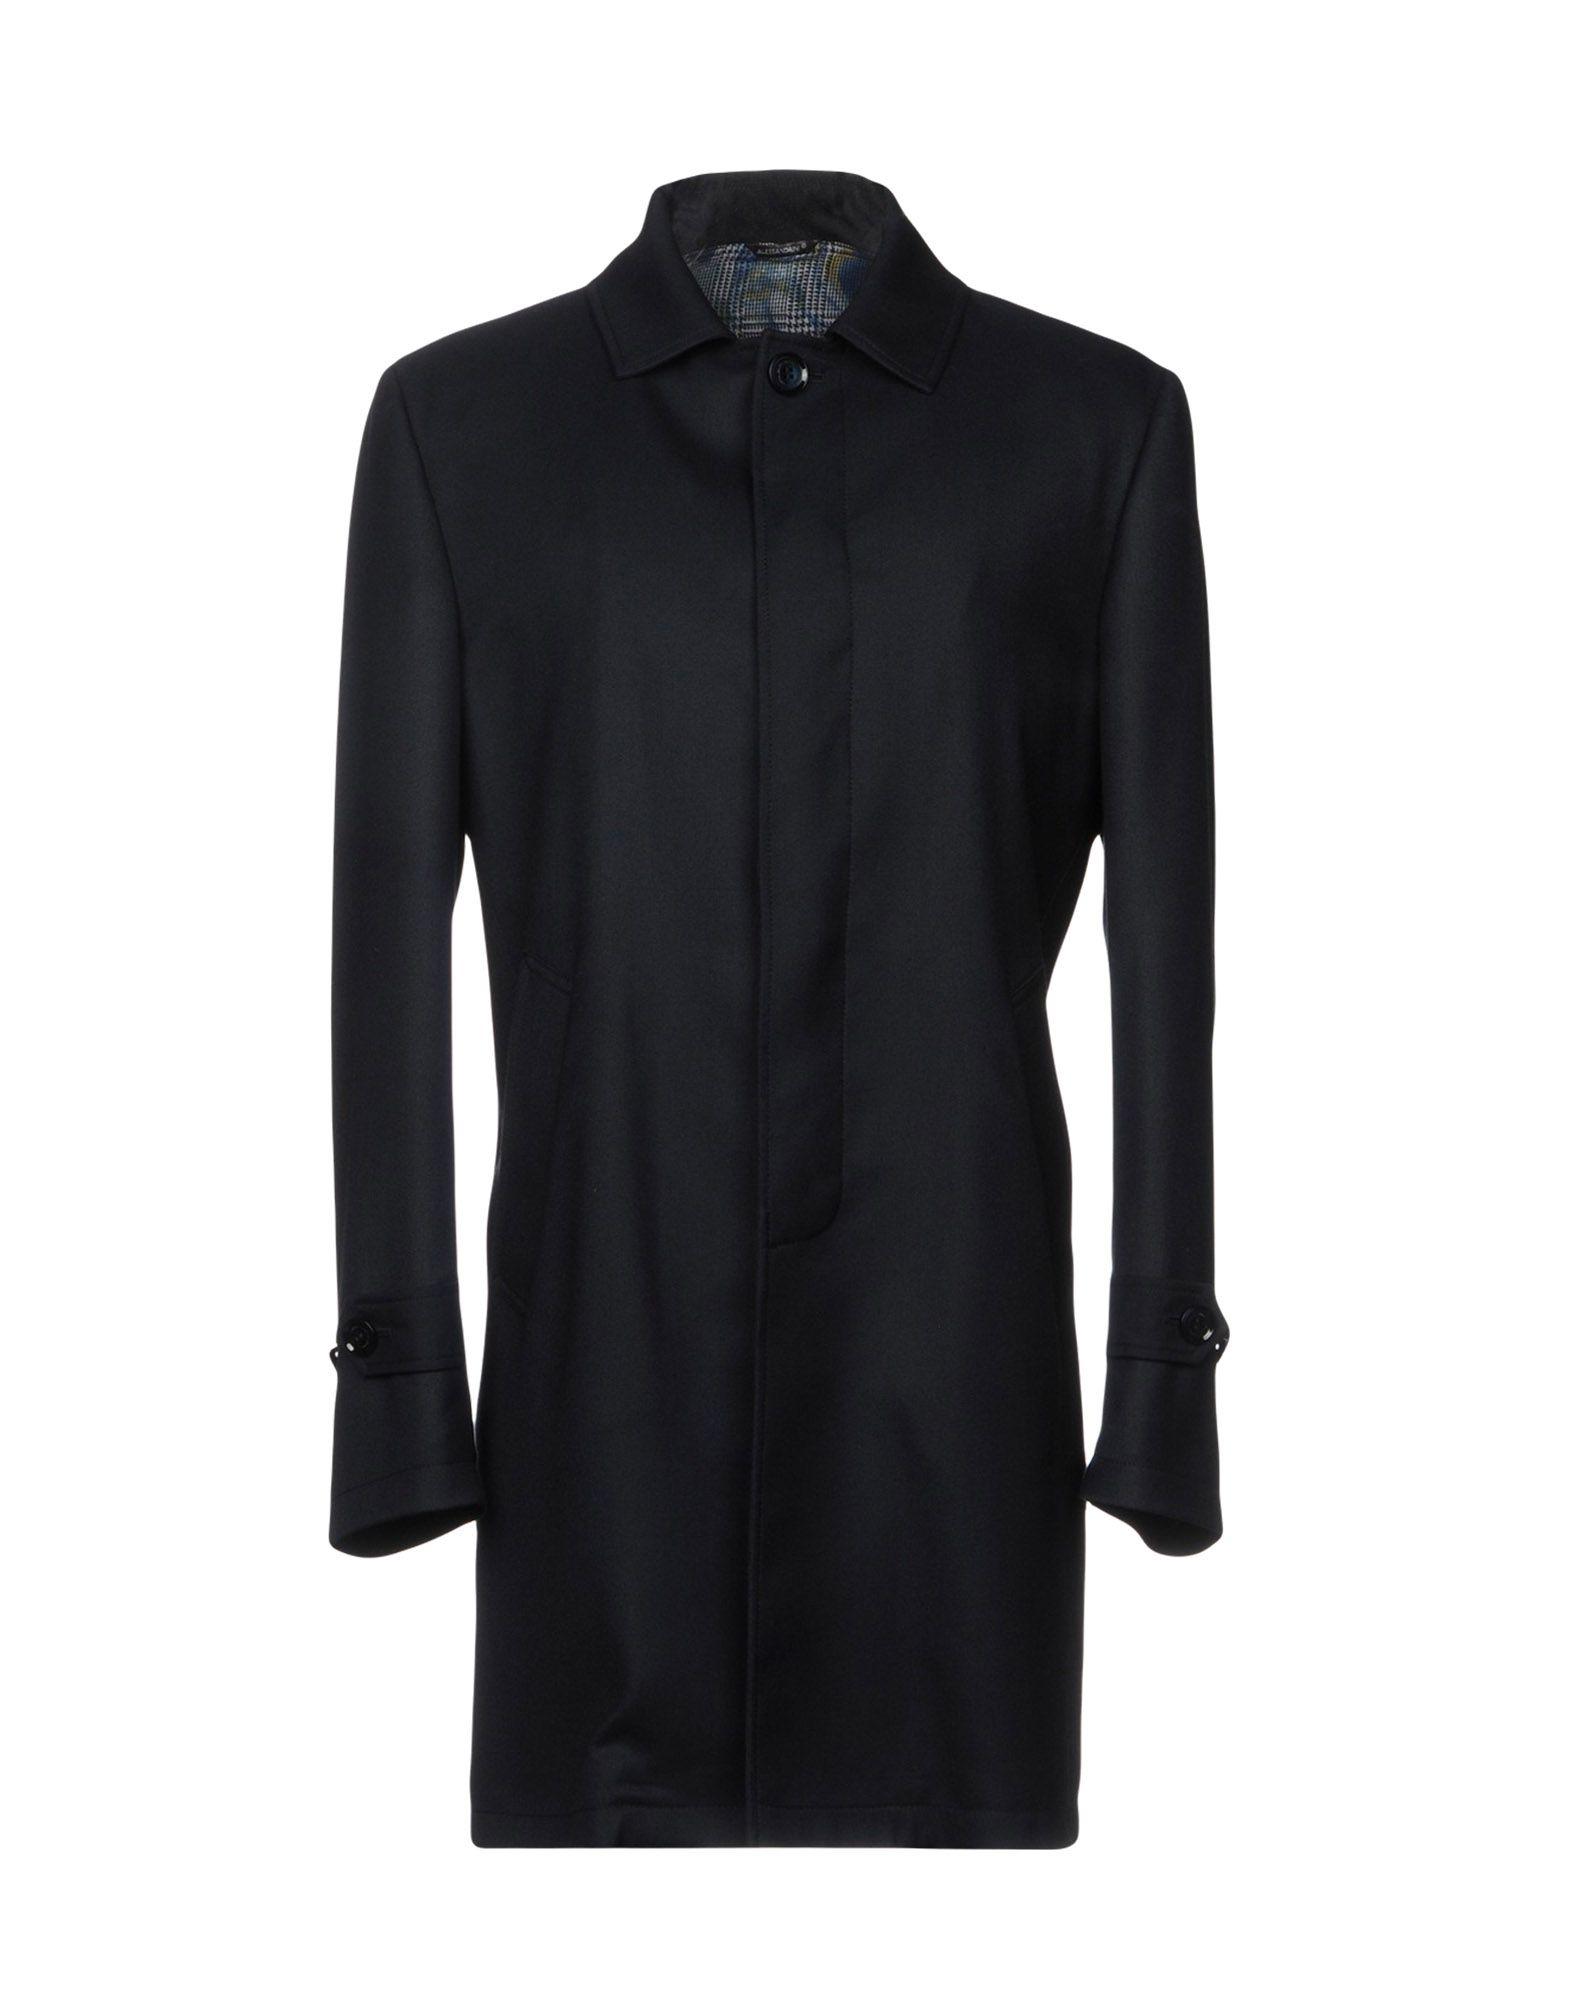 GREY DANIELE ALESSANDRINI Overcoats in Dark Blue